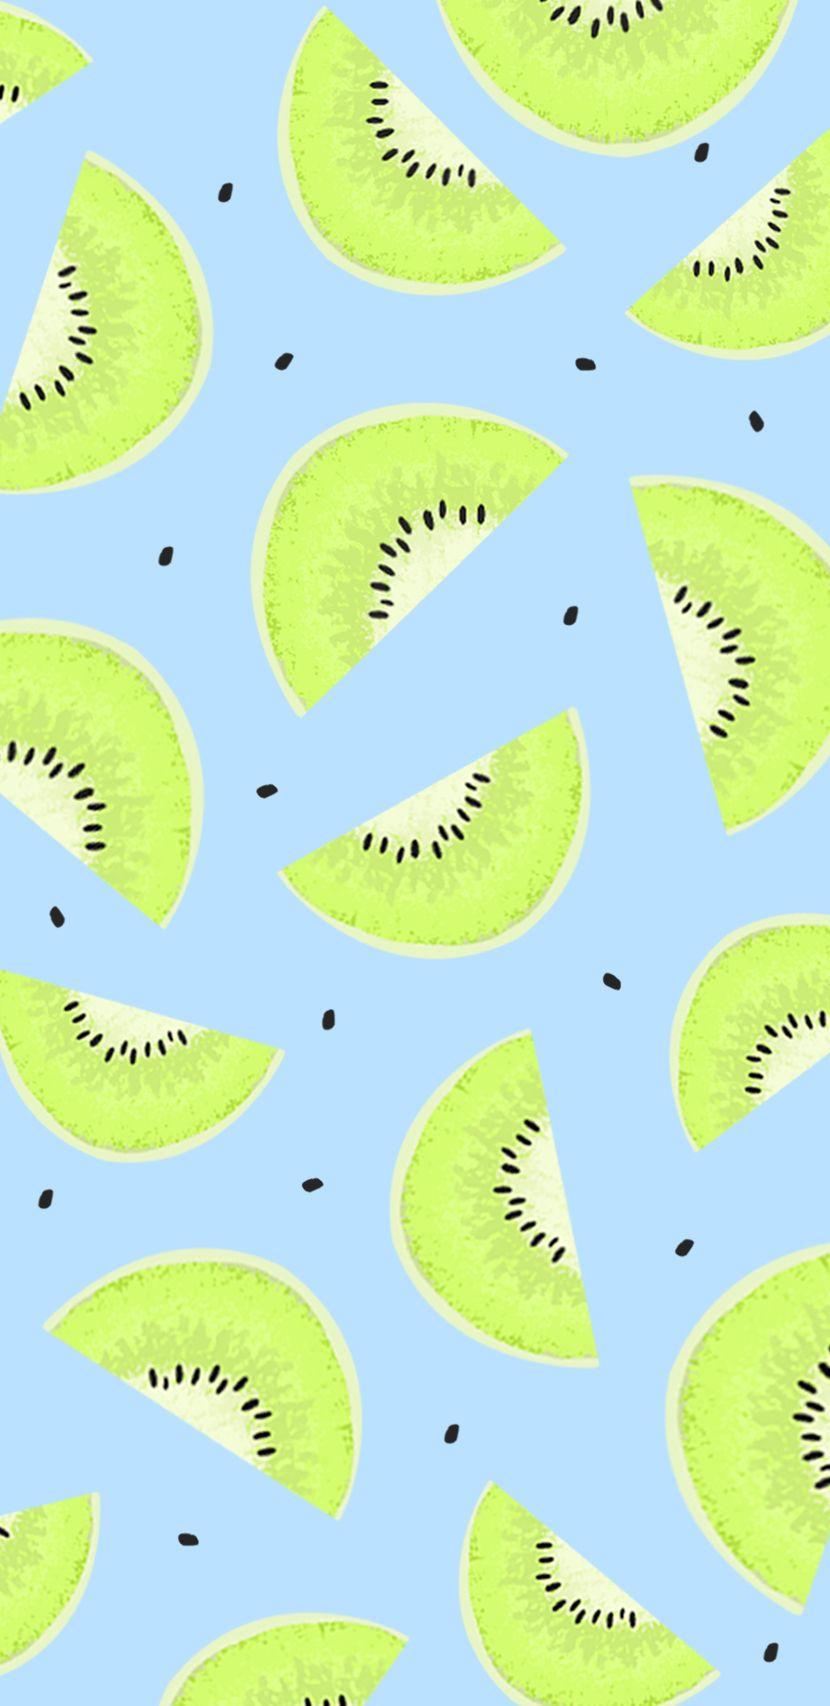 kiwi fruit summer pastel colors wallpaper screensaver iphone 830x1706